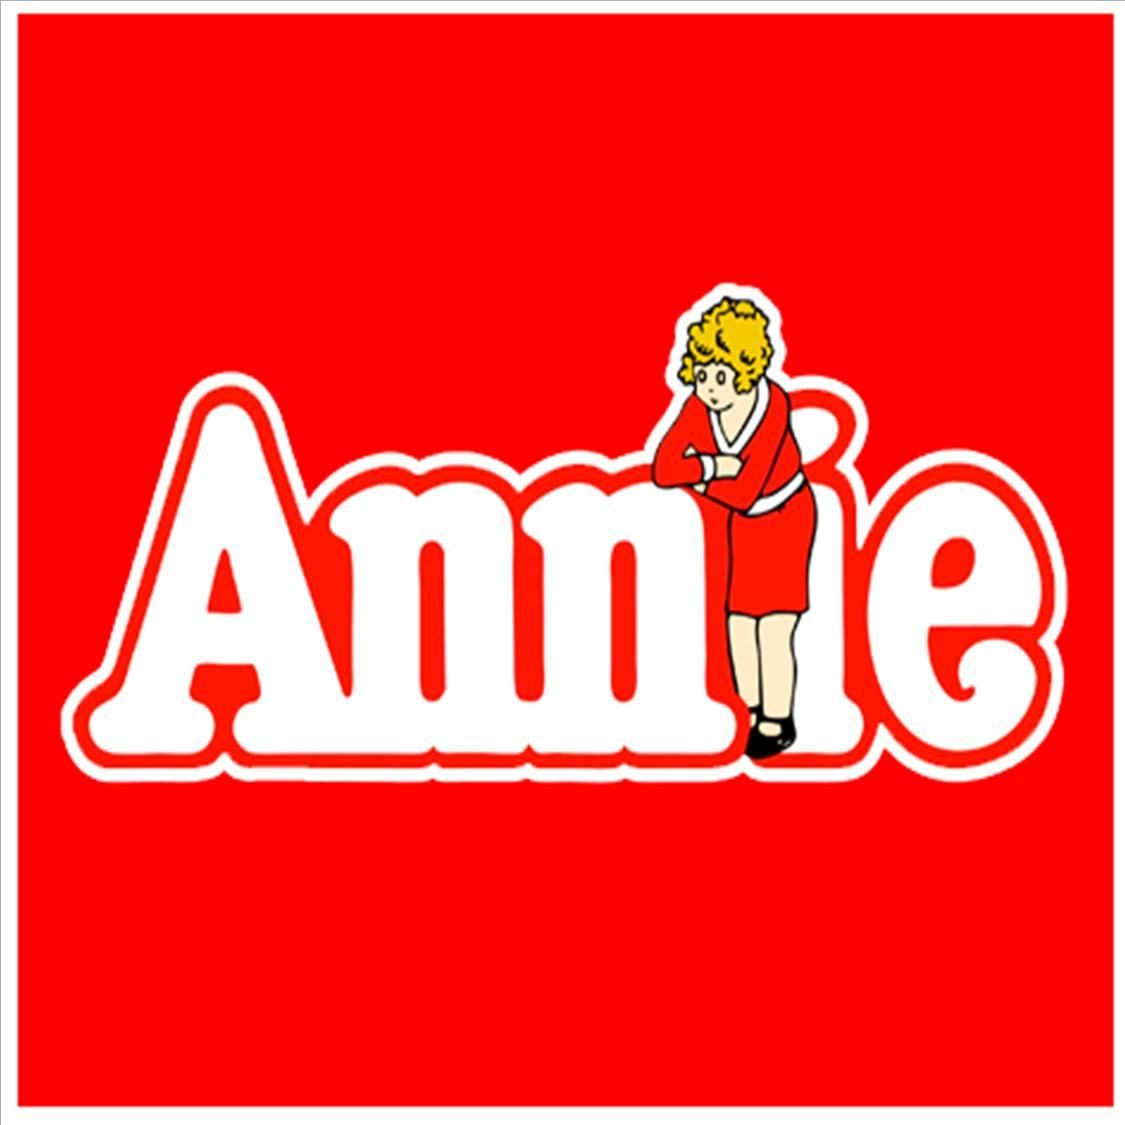 Annie Logo Annie, Bart simpson, Fictional characters